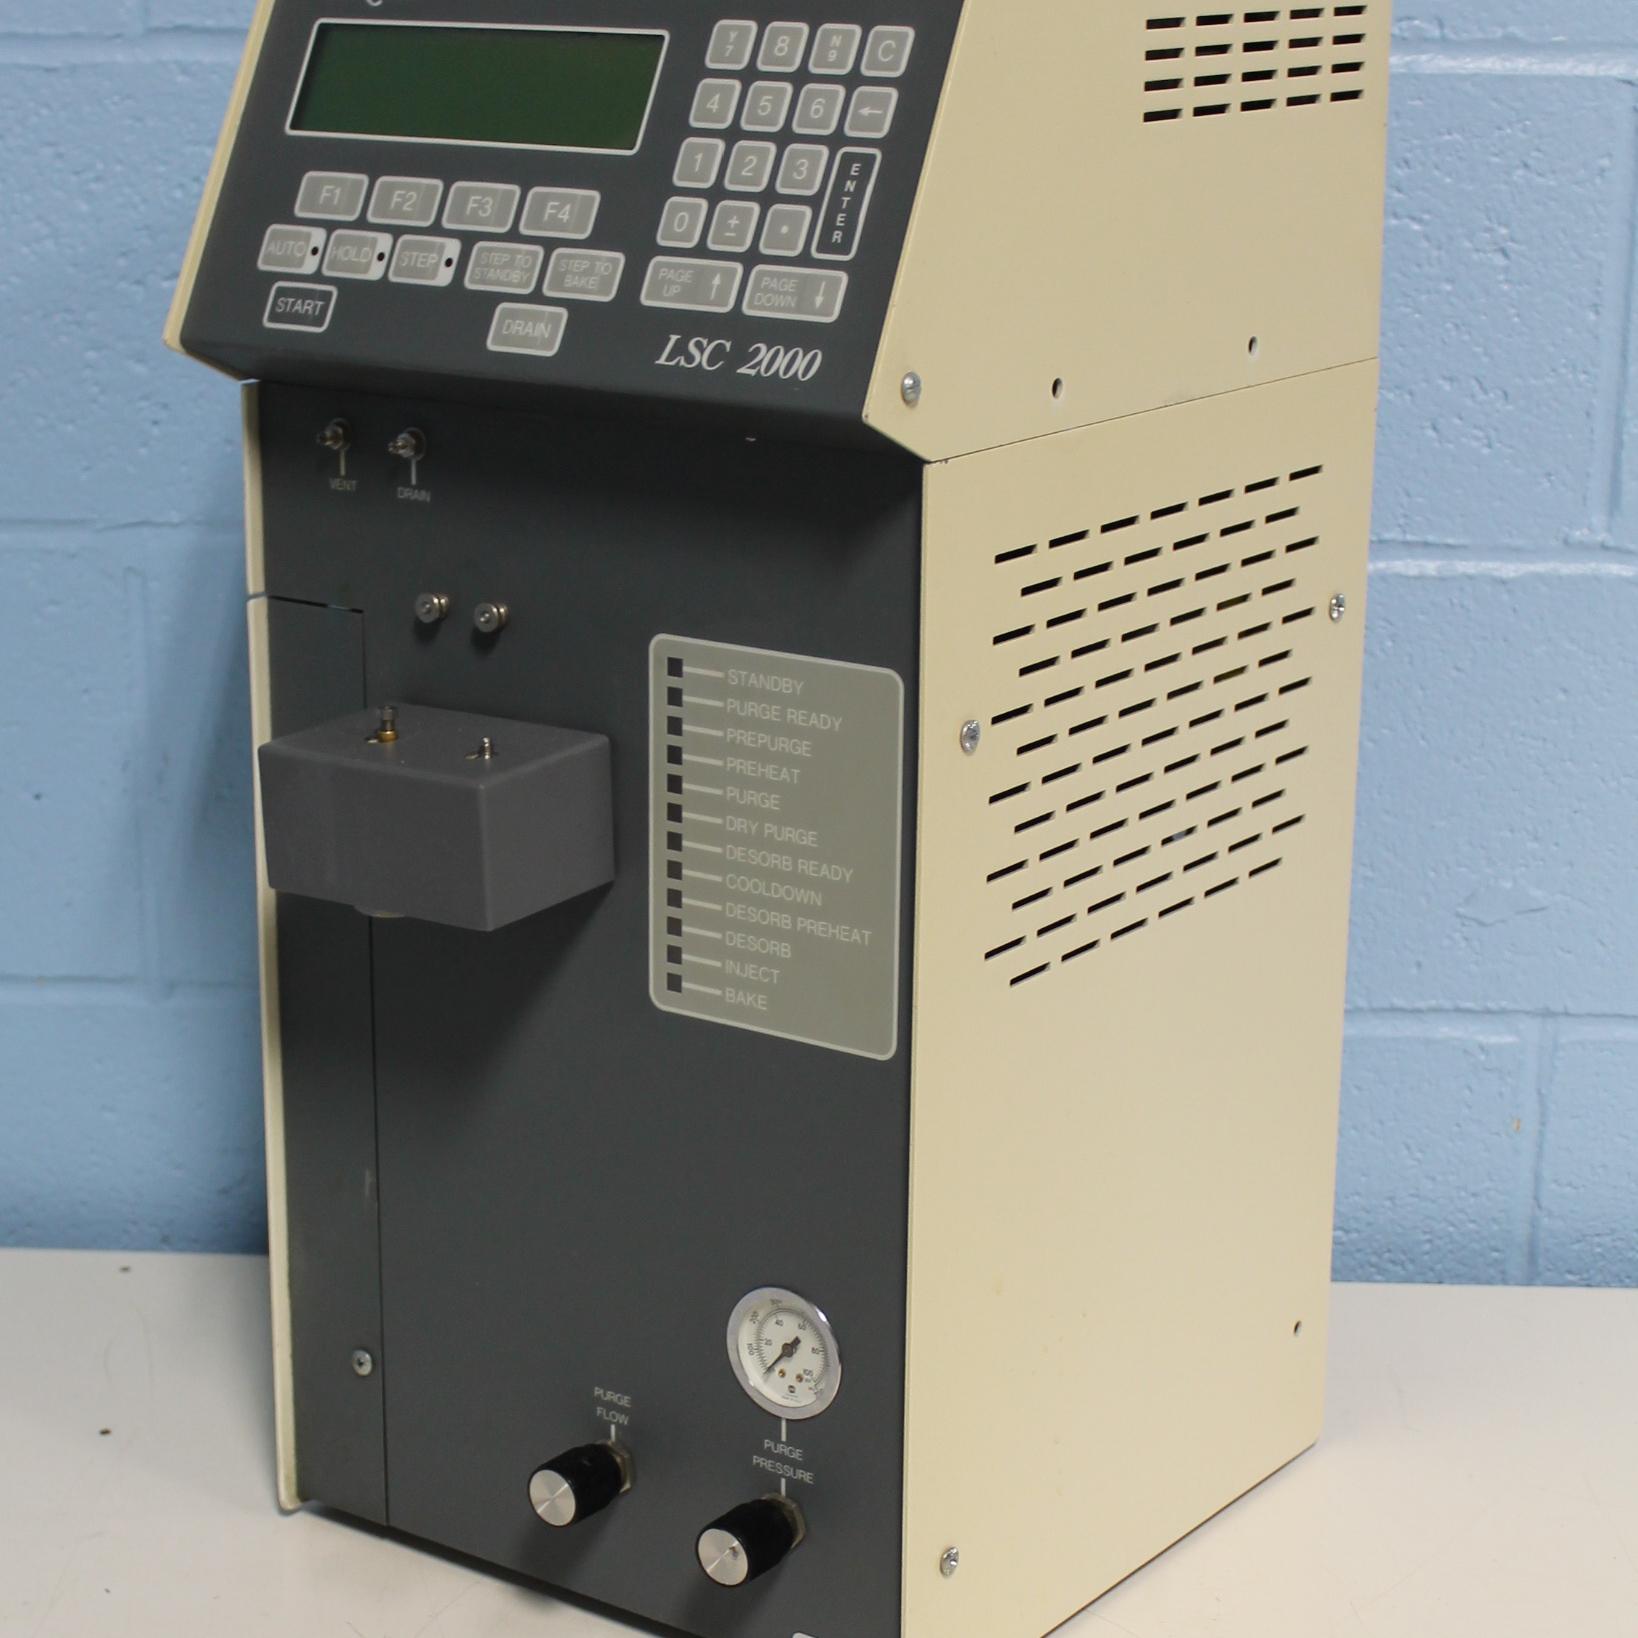 Tekmar LSC 2000 Concentrator Image